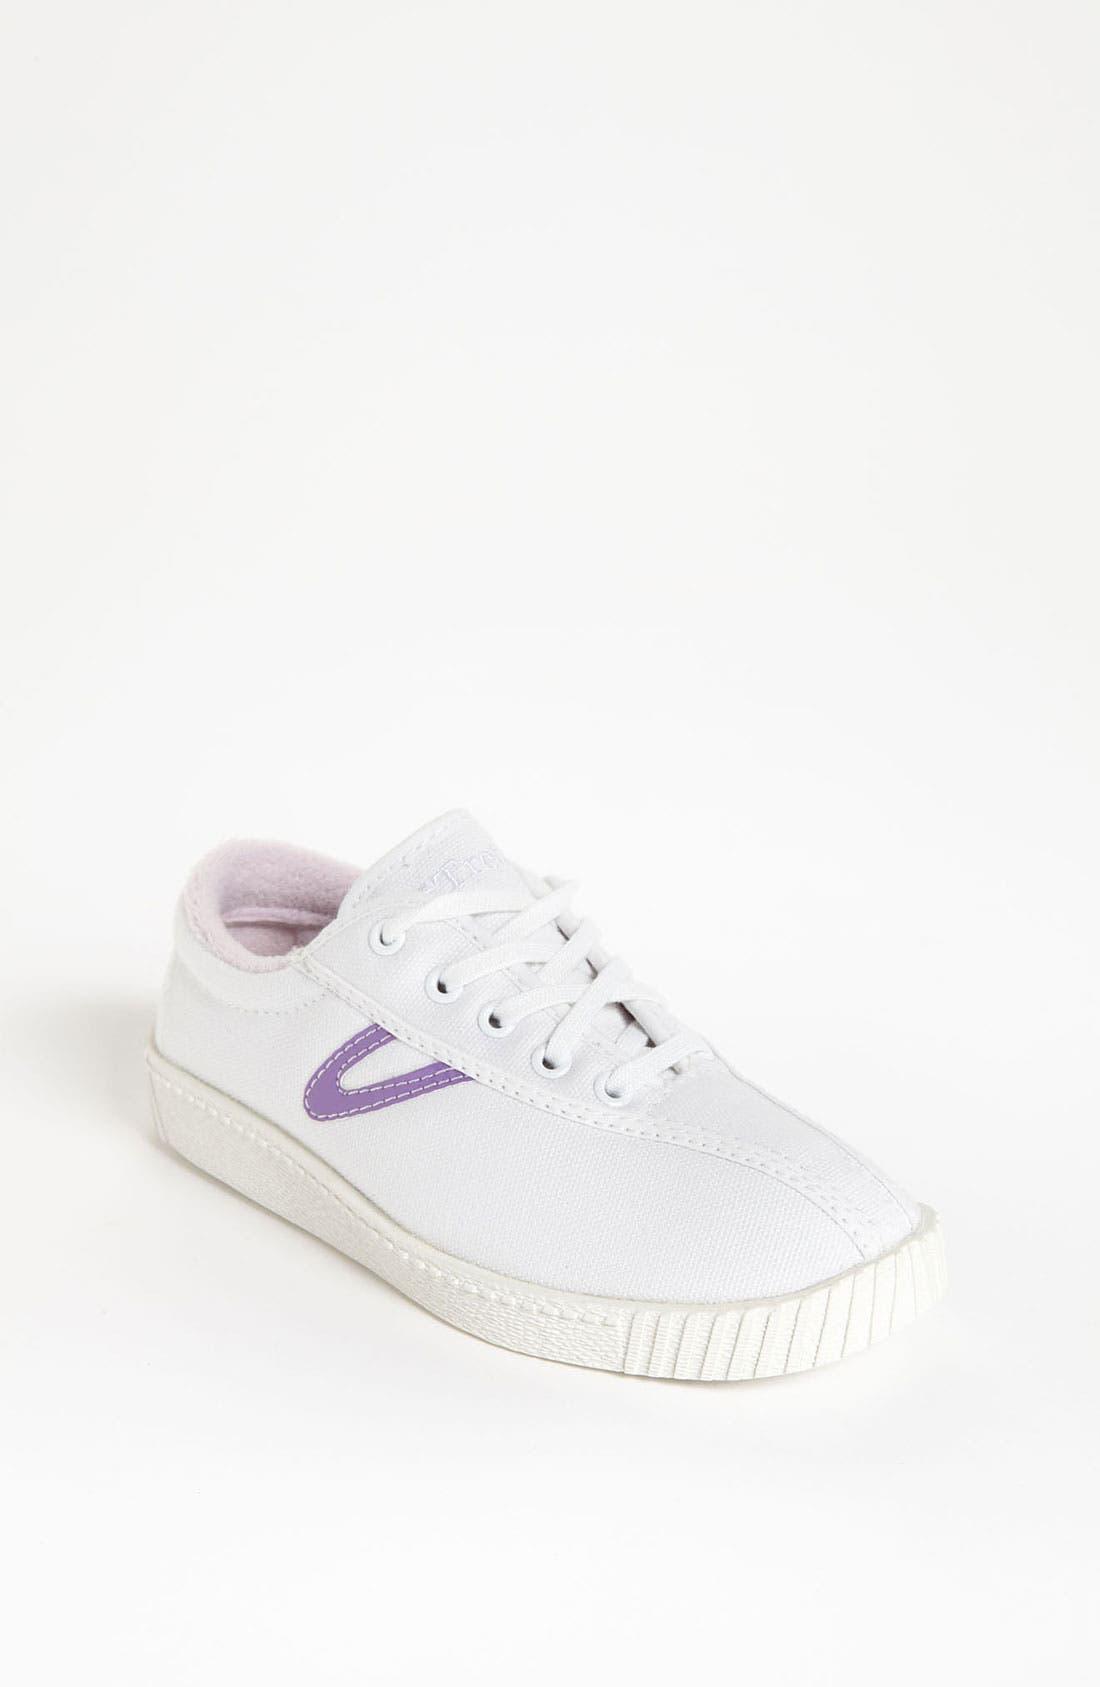 Main Image - Tretorn 'Nylite' Tennis Shoe (Toddler, Little Kid & Big Kid)